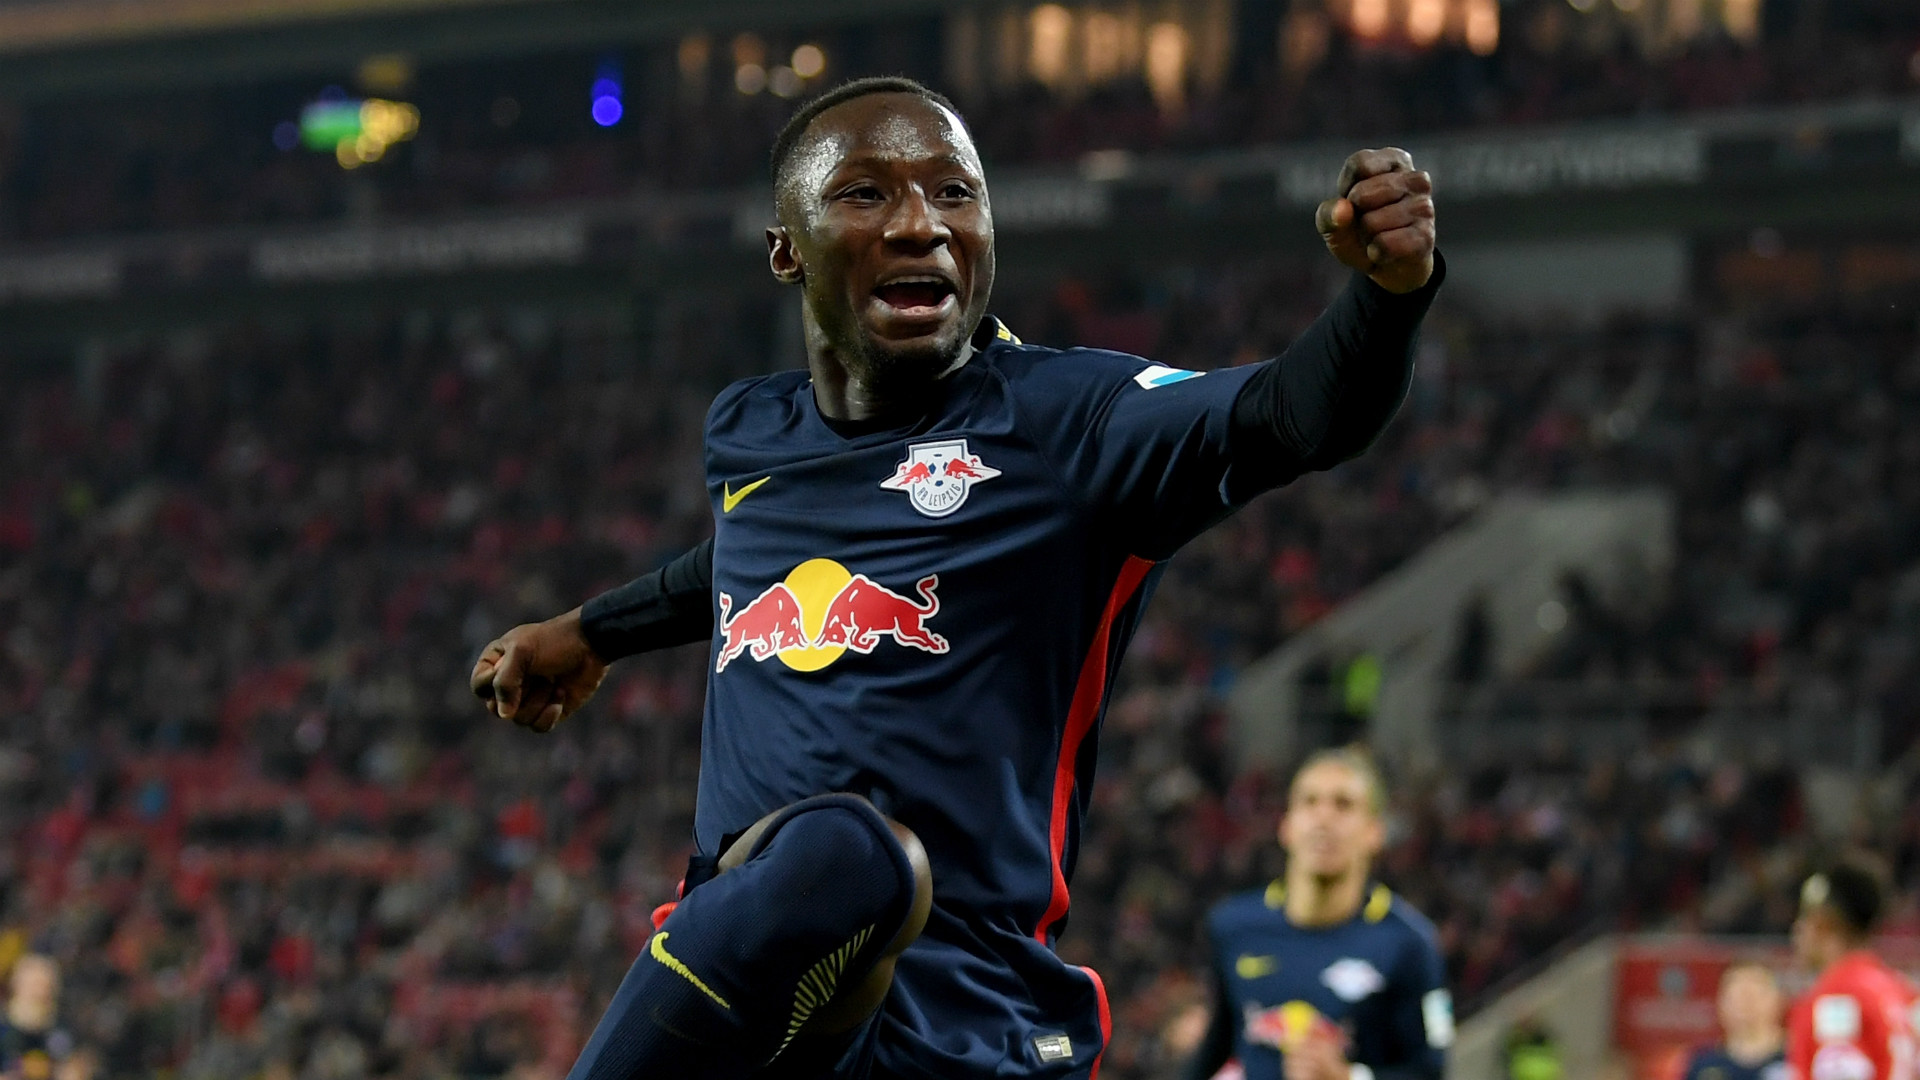 Naby Keita signe à Liverpool — Officiel